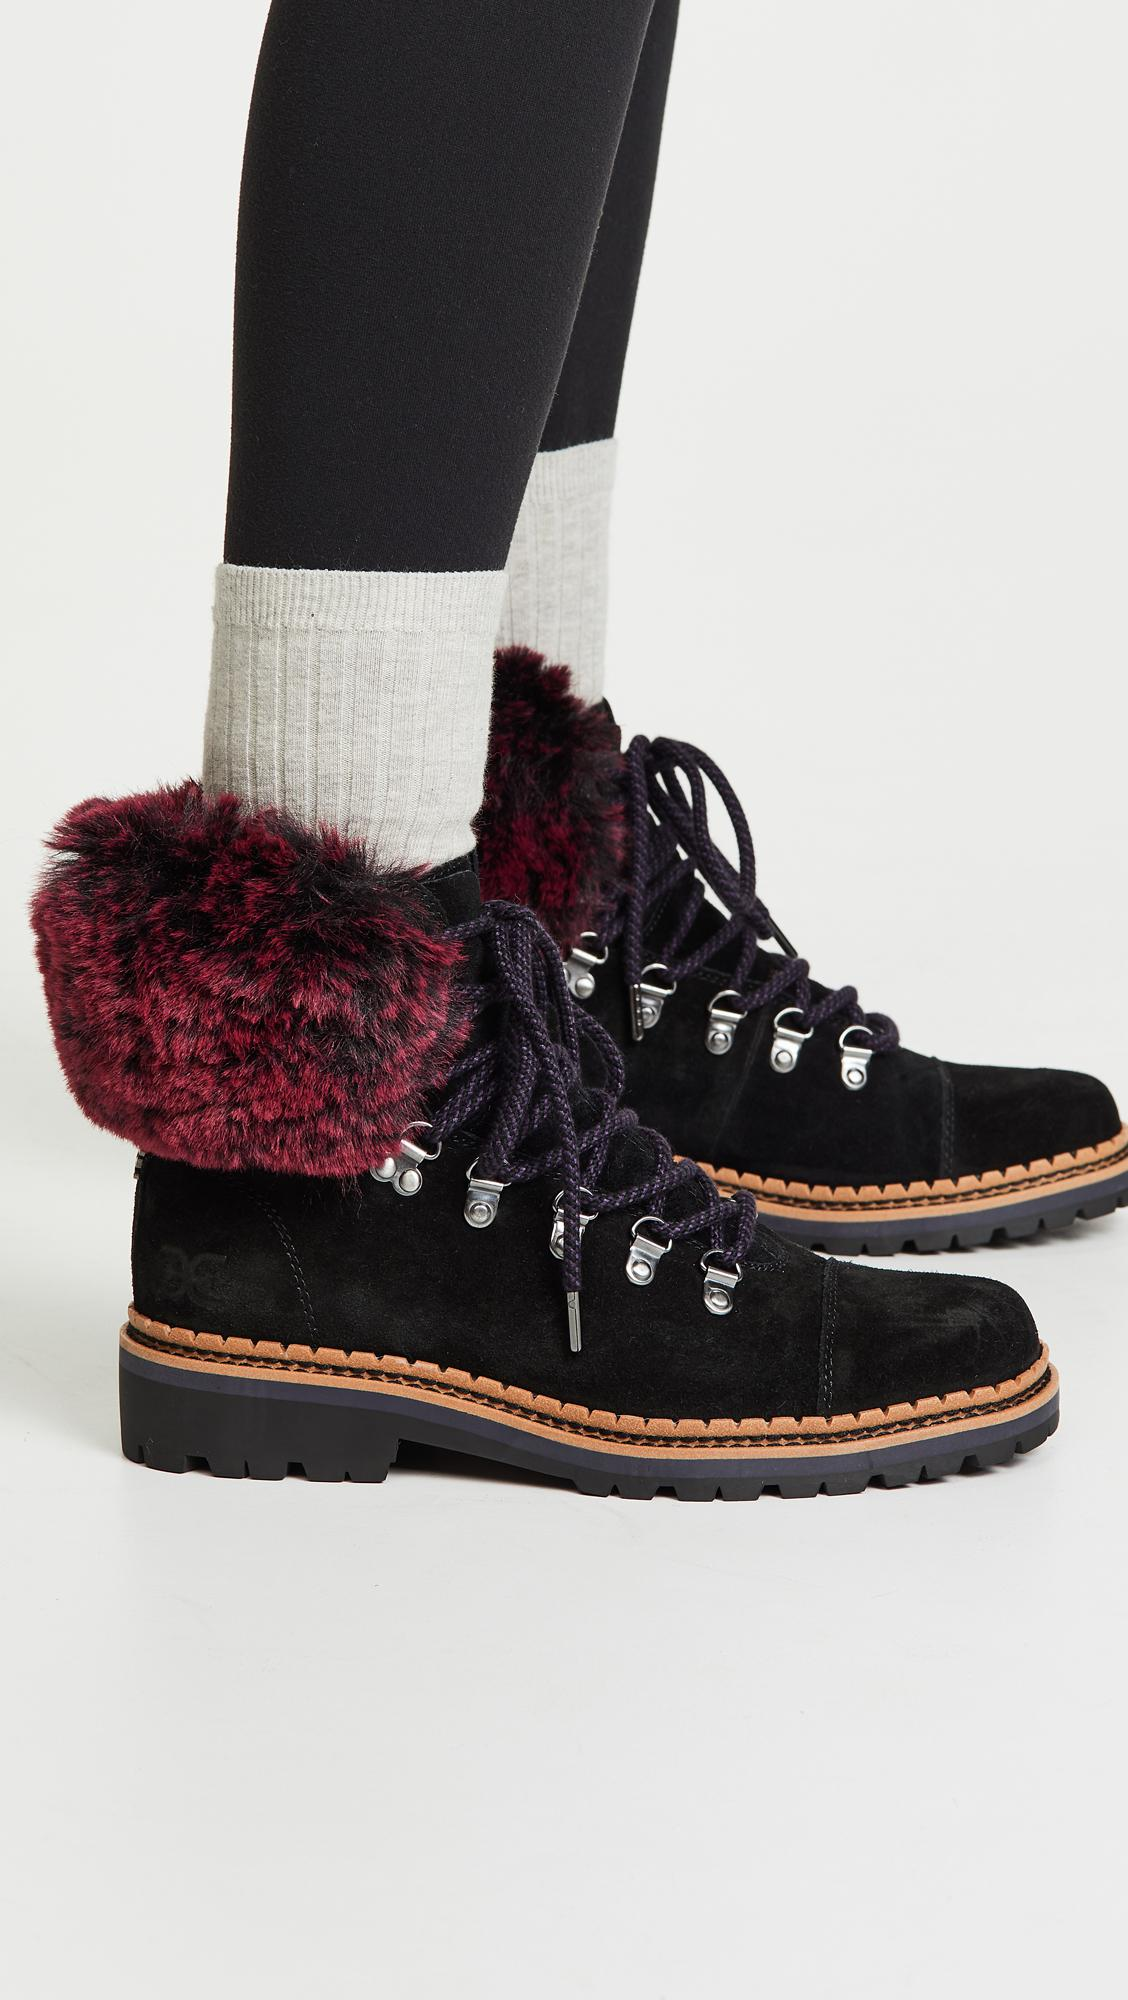 c4a72b4cb Sam Edelman - Black Bowen Fashion Boot - Lyst. View fullscreen